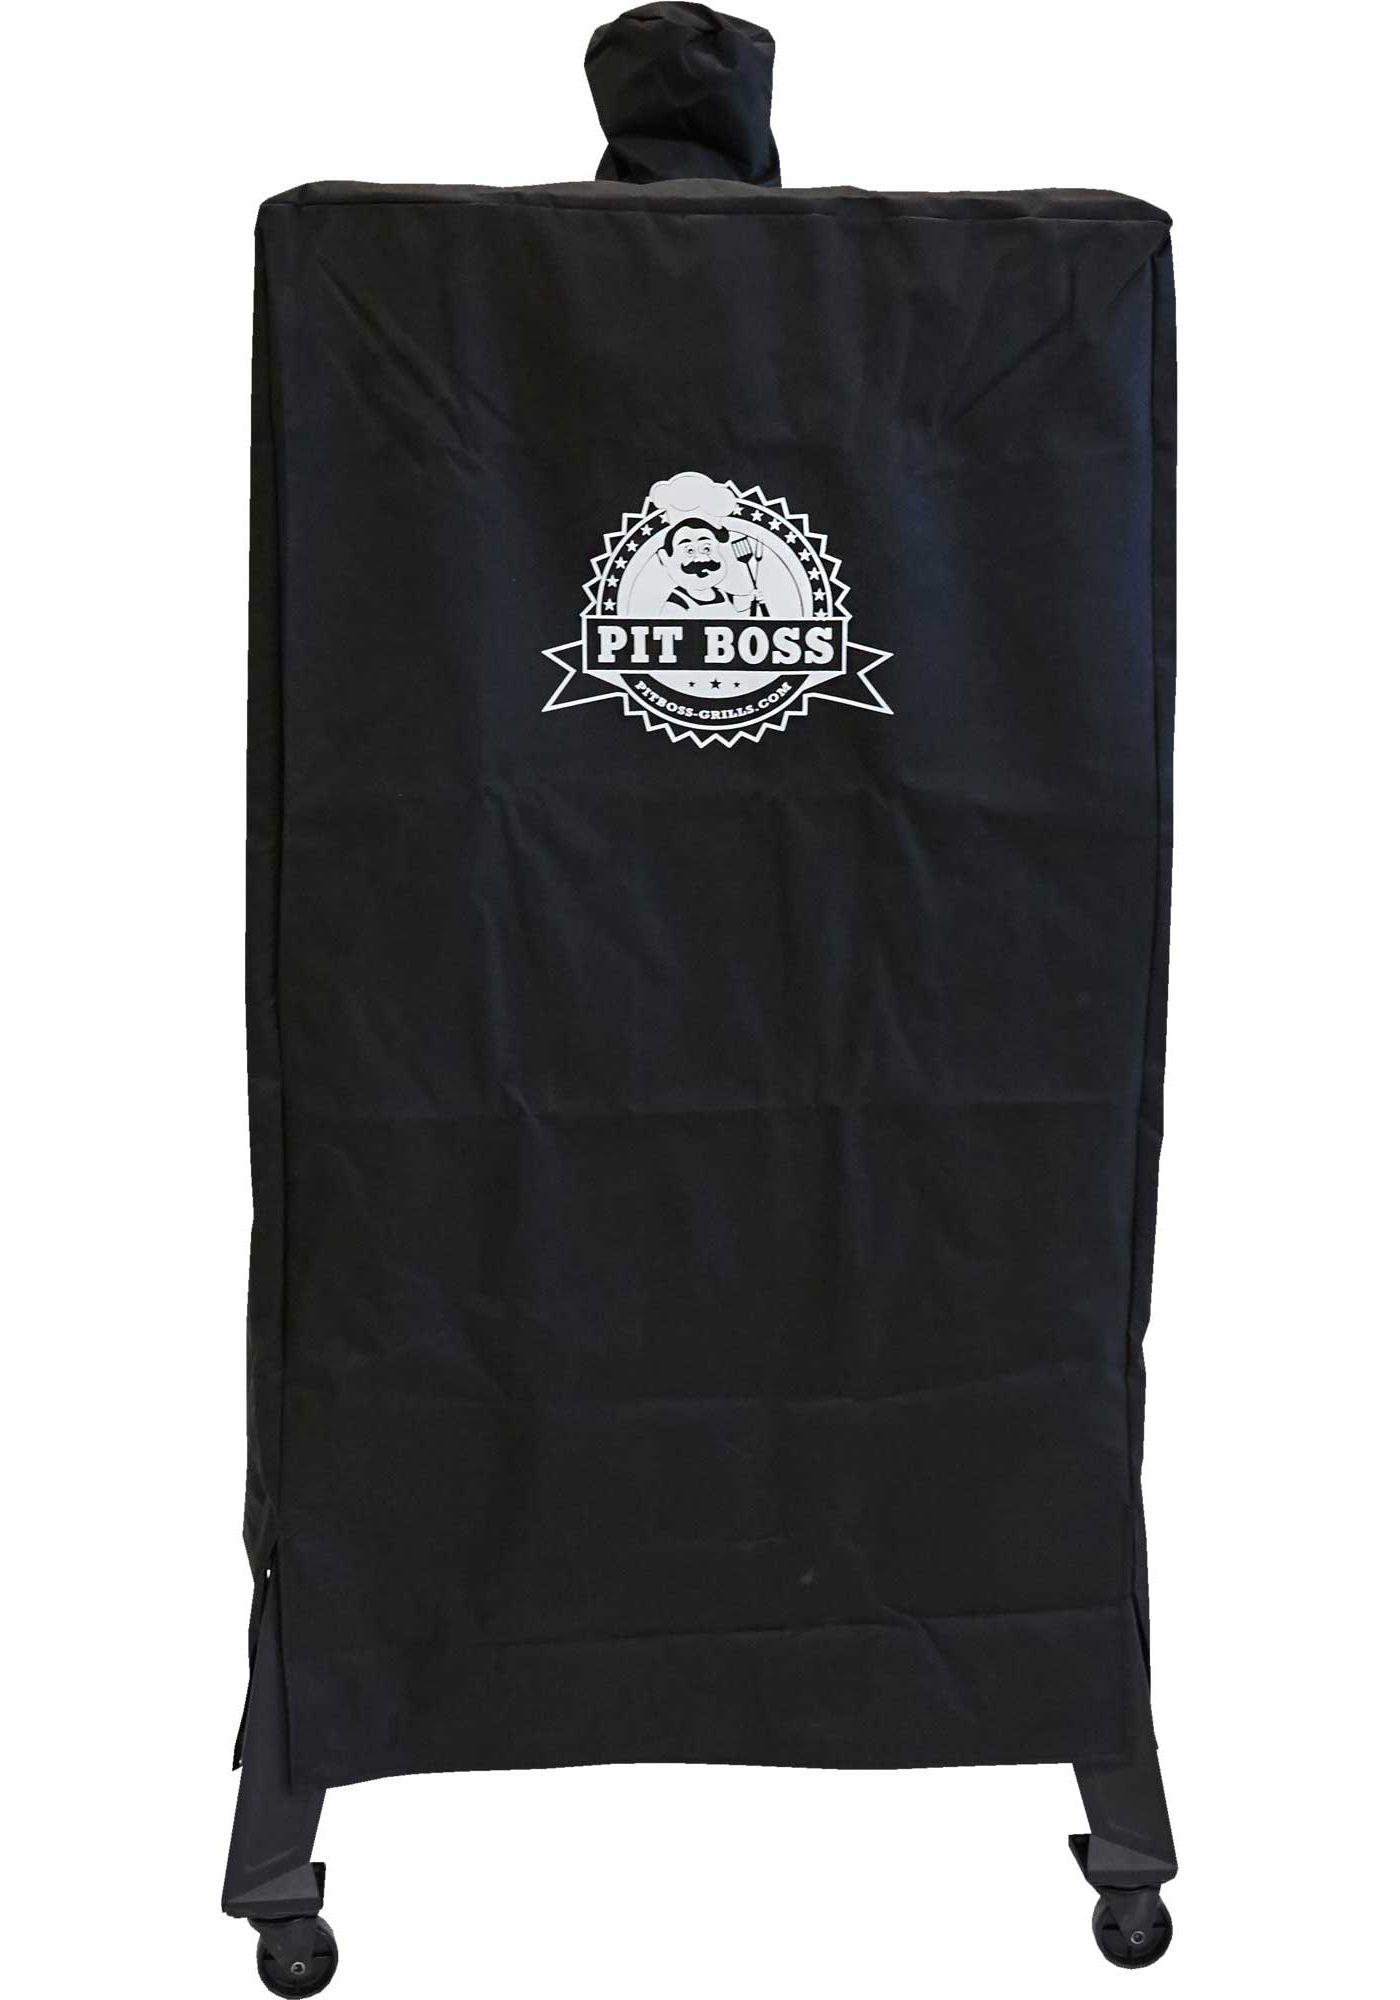 Pit Boss 7 Series Pellet Smoker Cover